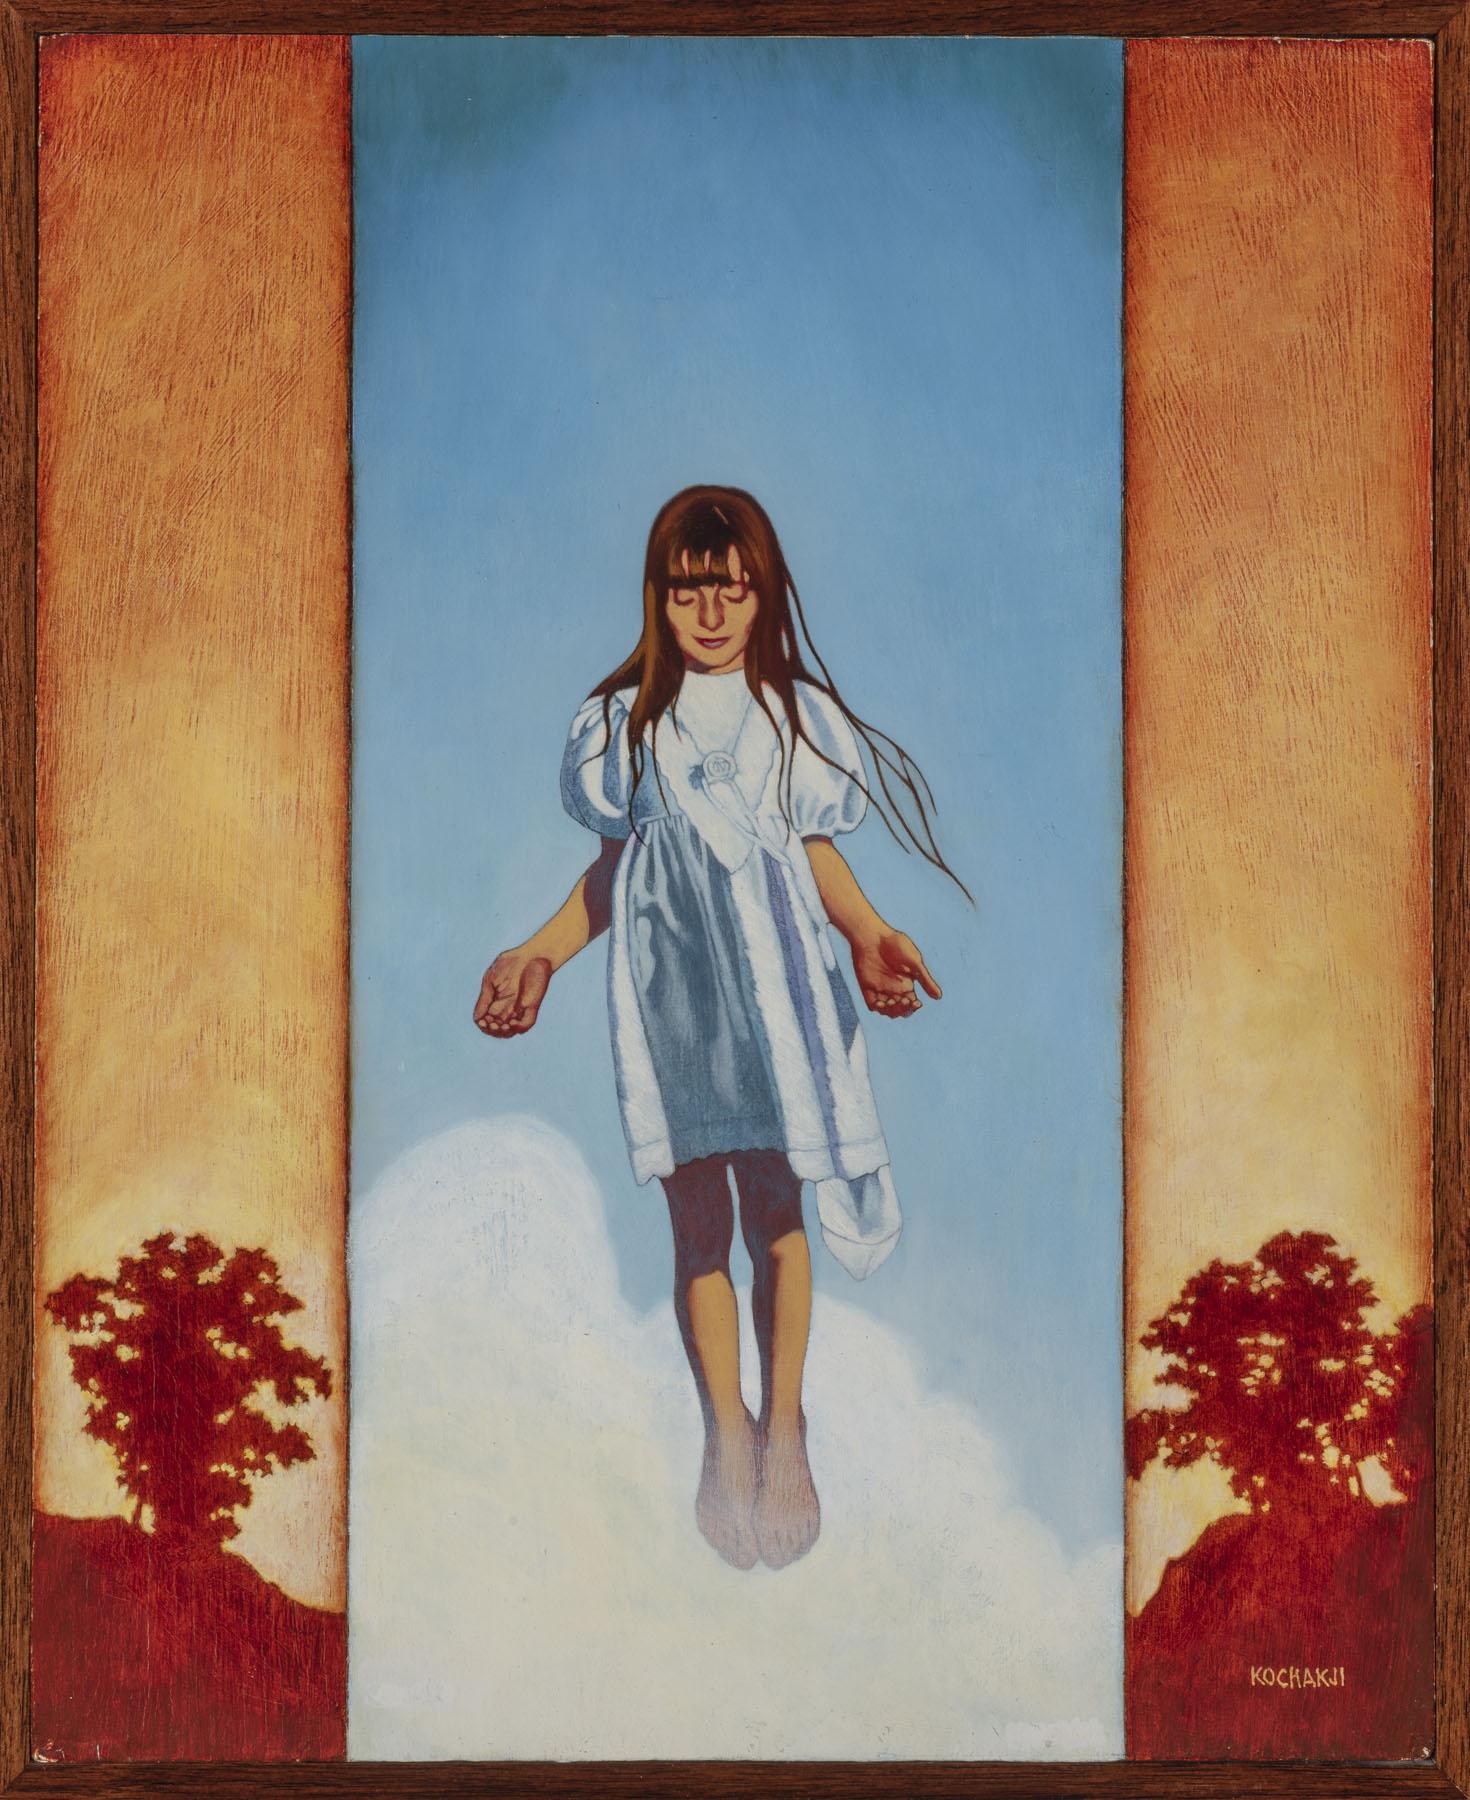 "The Healing - oil on panel - 11x13.5"" - Glendale Publishing"